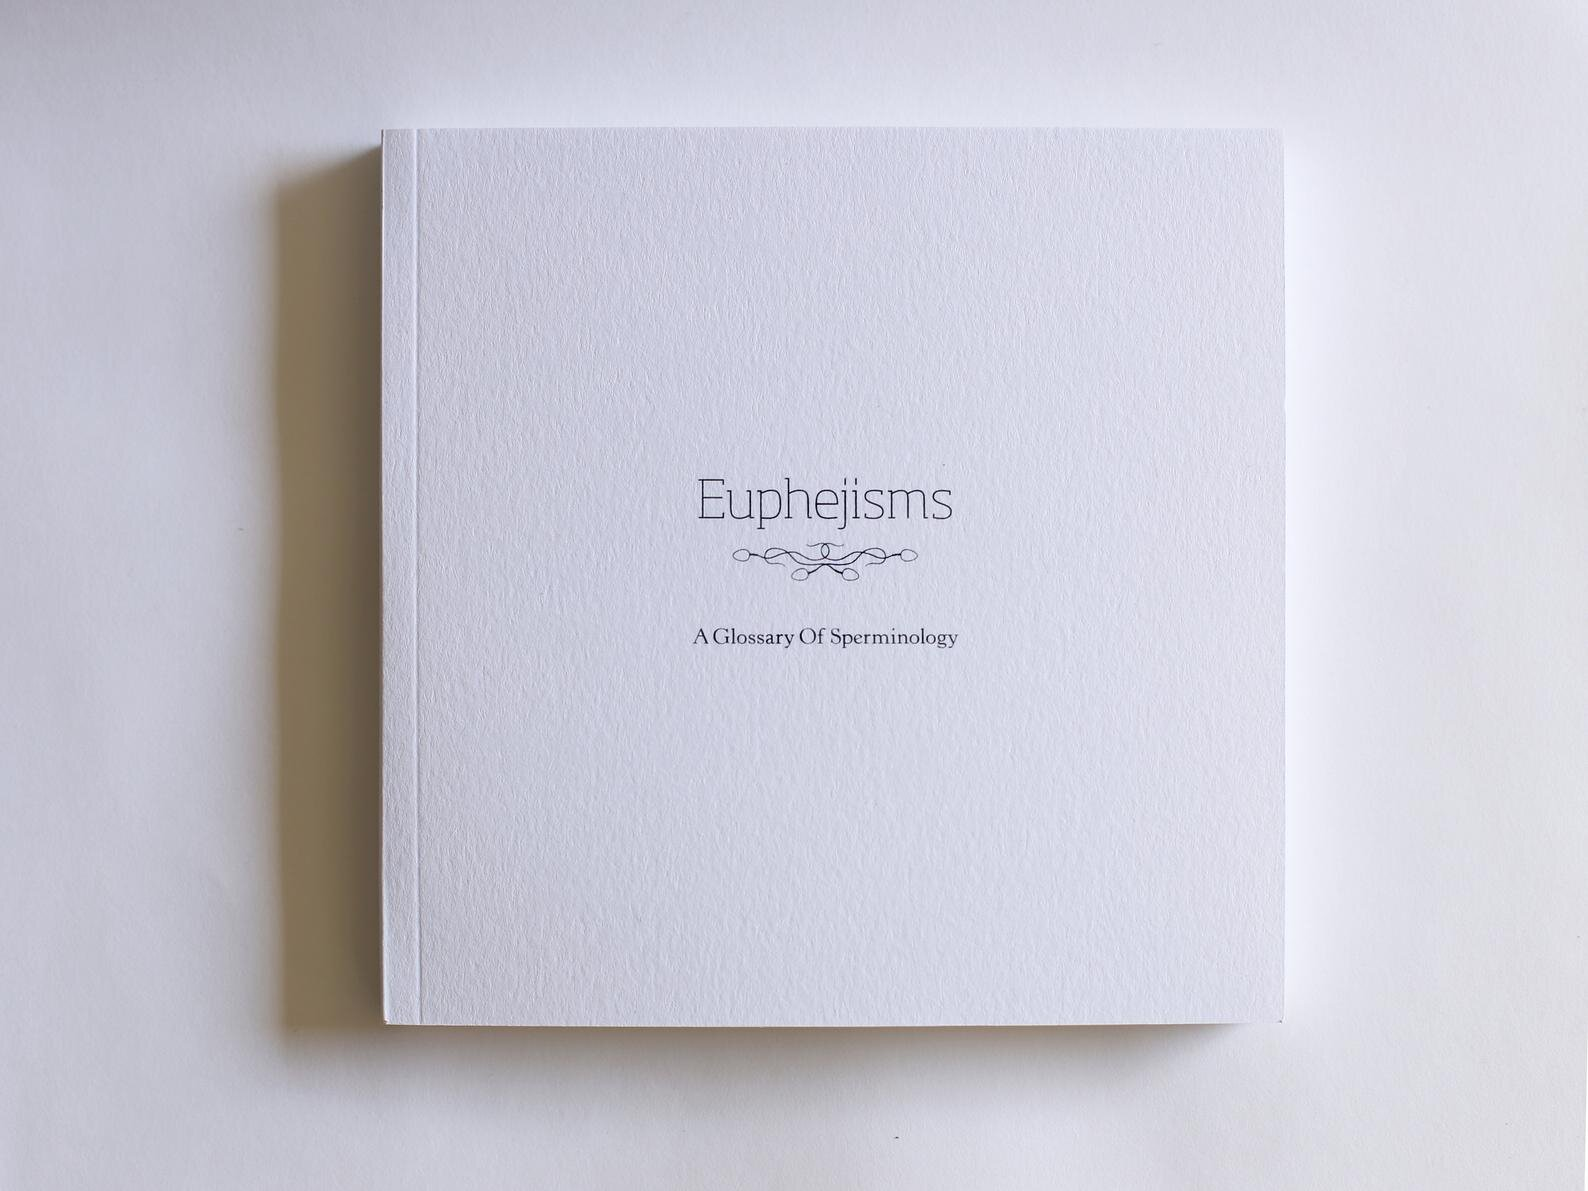 Euphejisms Book from Kiran Koshy l Miller + Miller l A Creative Production Talent Agency